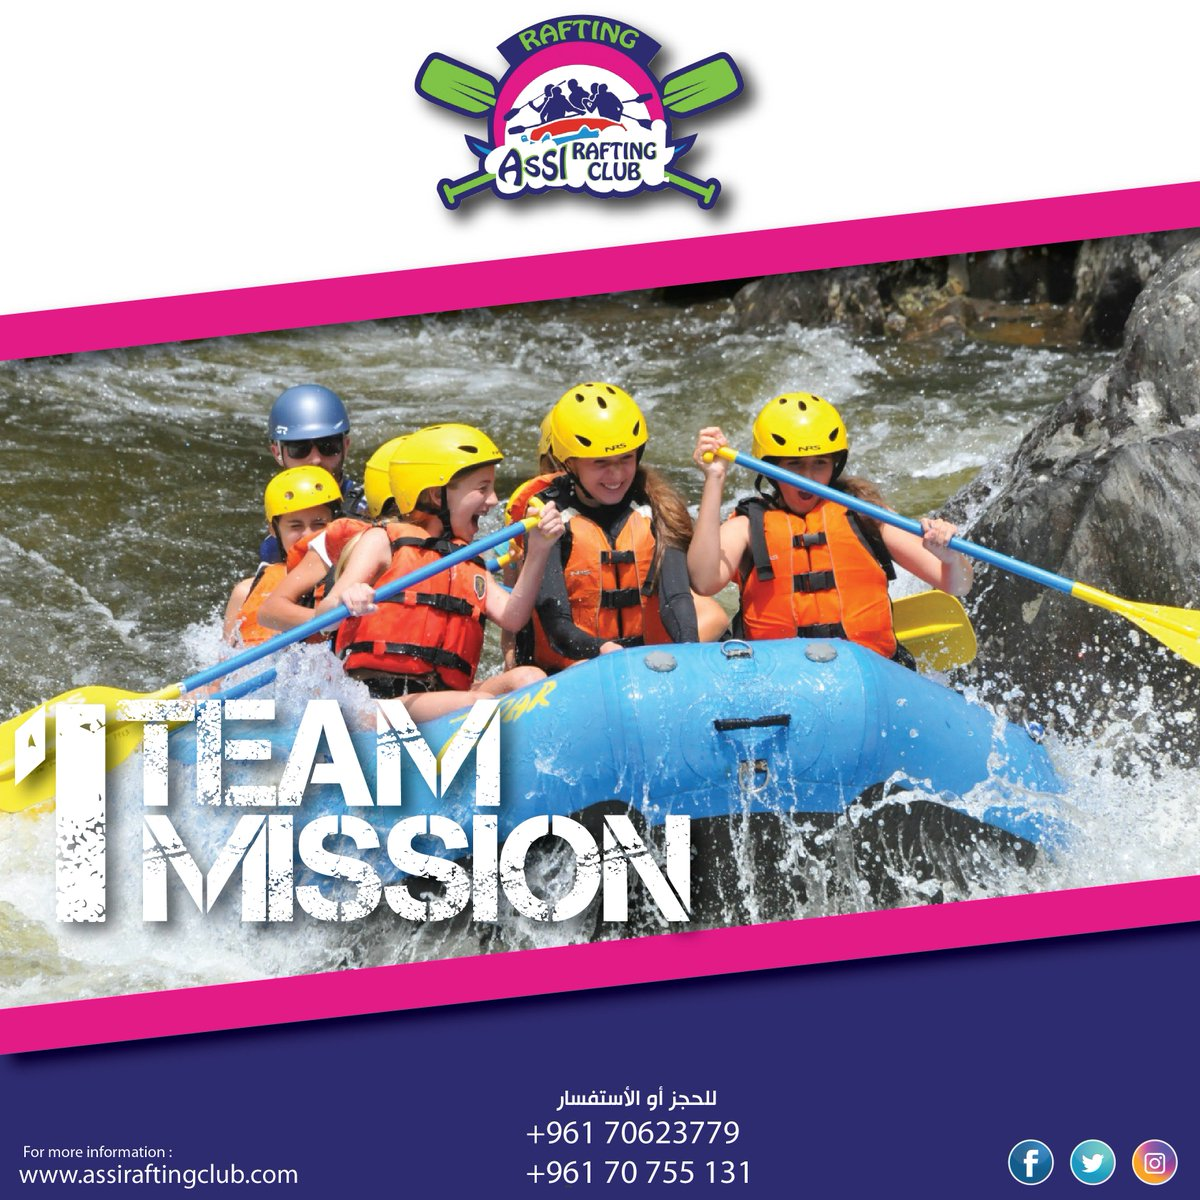 WELCOME TO ASSI RAFTING CLUB~ Tel: 961- 70623779  http://www. AssiRaftingClub.com  &nbsp;   #Assi #Rafting #Lebanon #Hermel #Adventures #Club #entertainment <br>http://pic.twitter.com/qZ4iPPM6cG